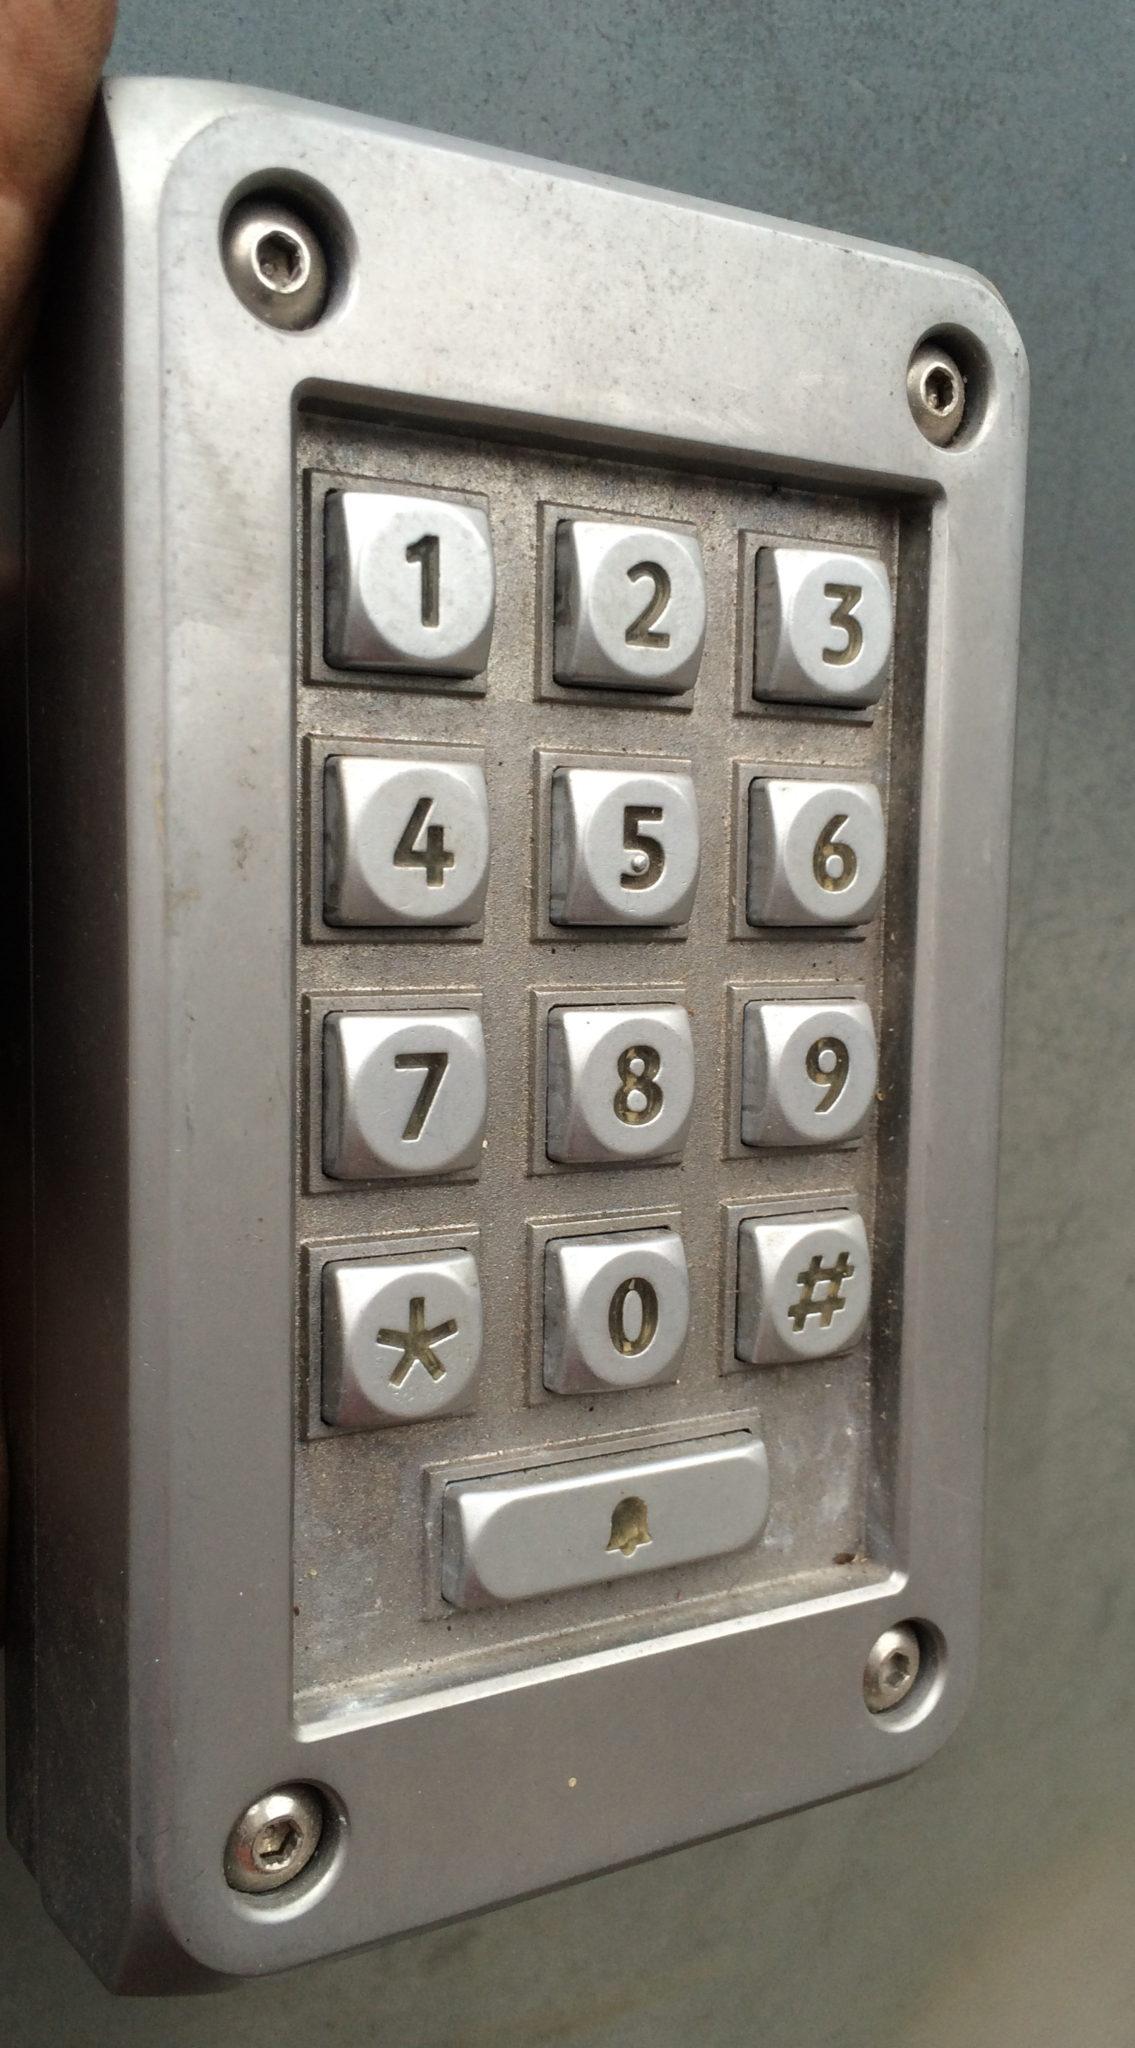 Push Button Entry Keypad - I